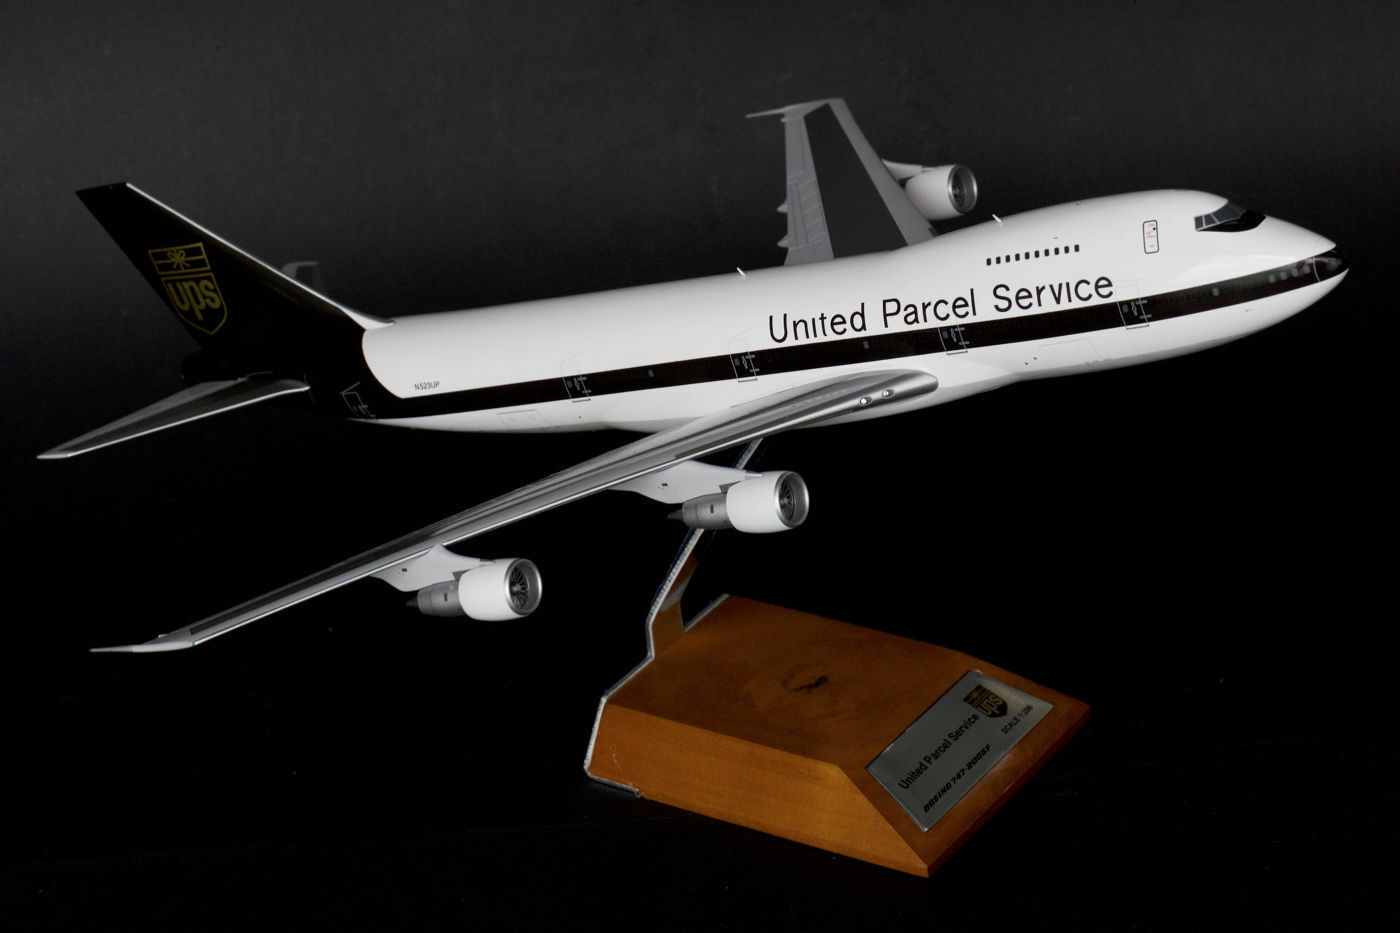 JC Wings 1 200 United Parcel Service (UPS) Boeing B747-200F N523UP